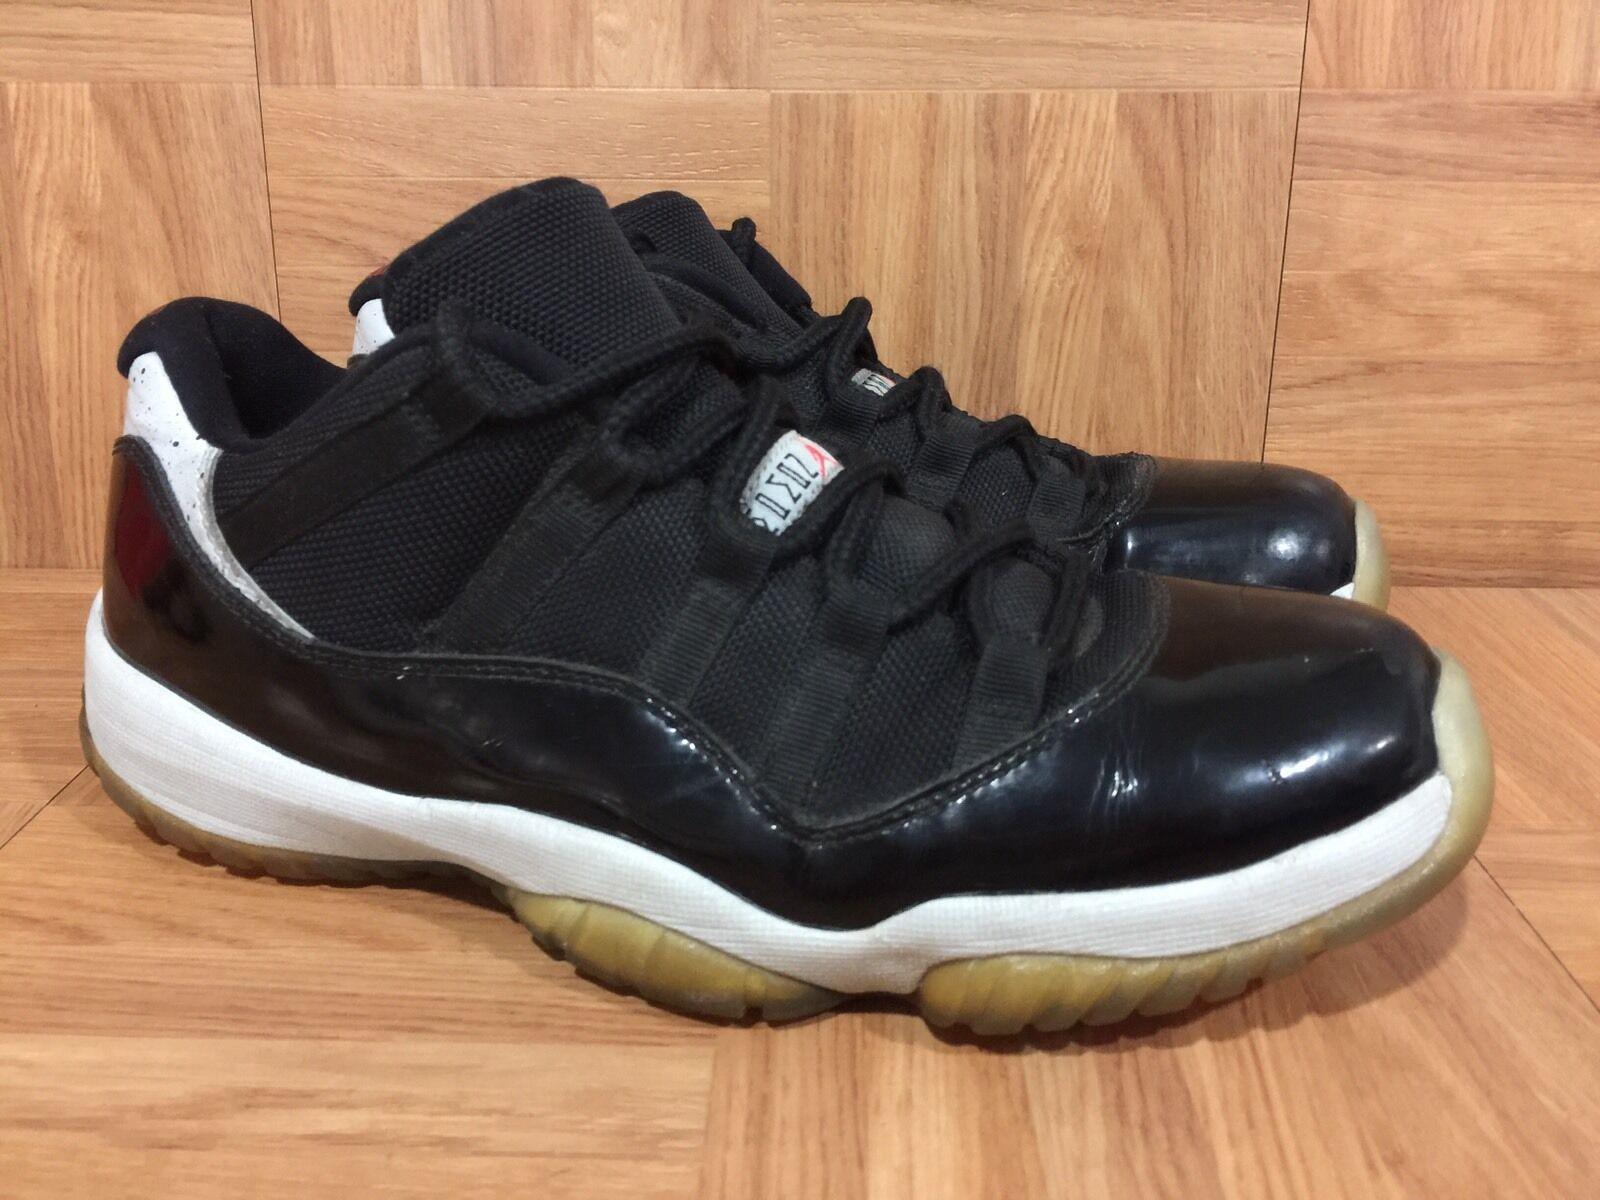 RARE Nike Air Jordan 11 XI Retro Low Infrared 23 Tuxedo Sz 8 shoes 528895-023